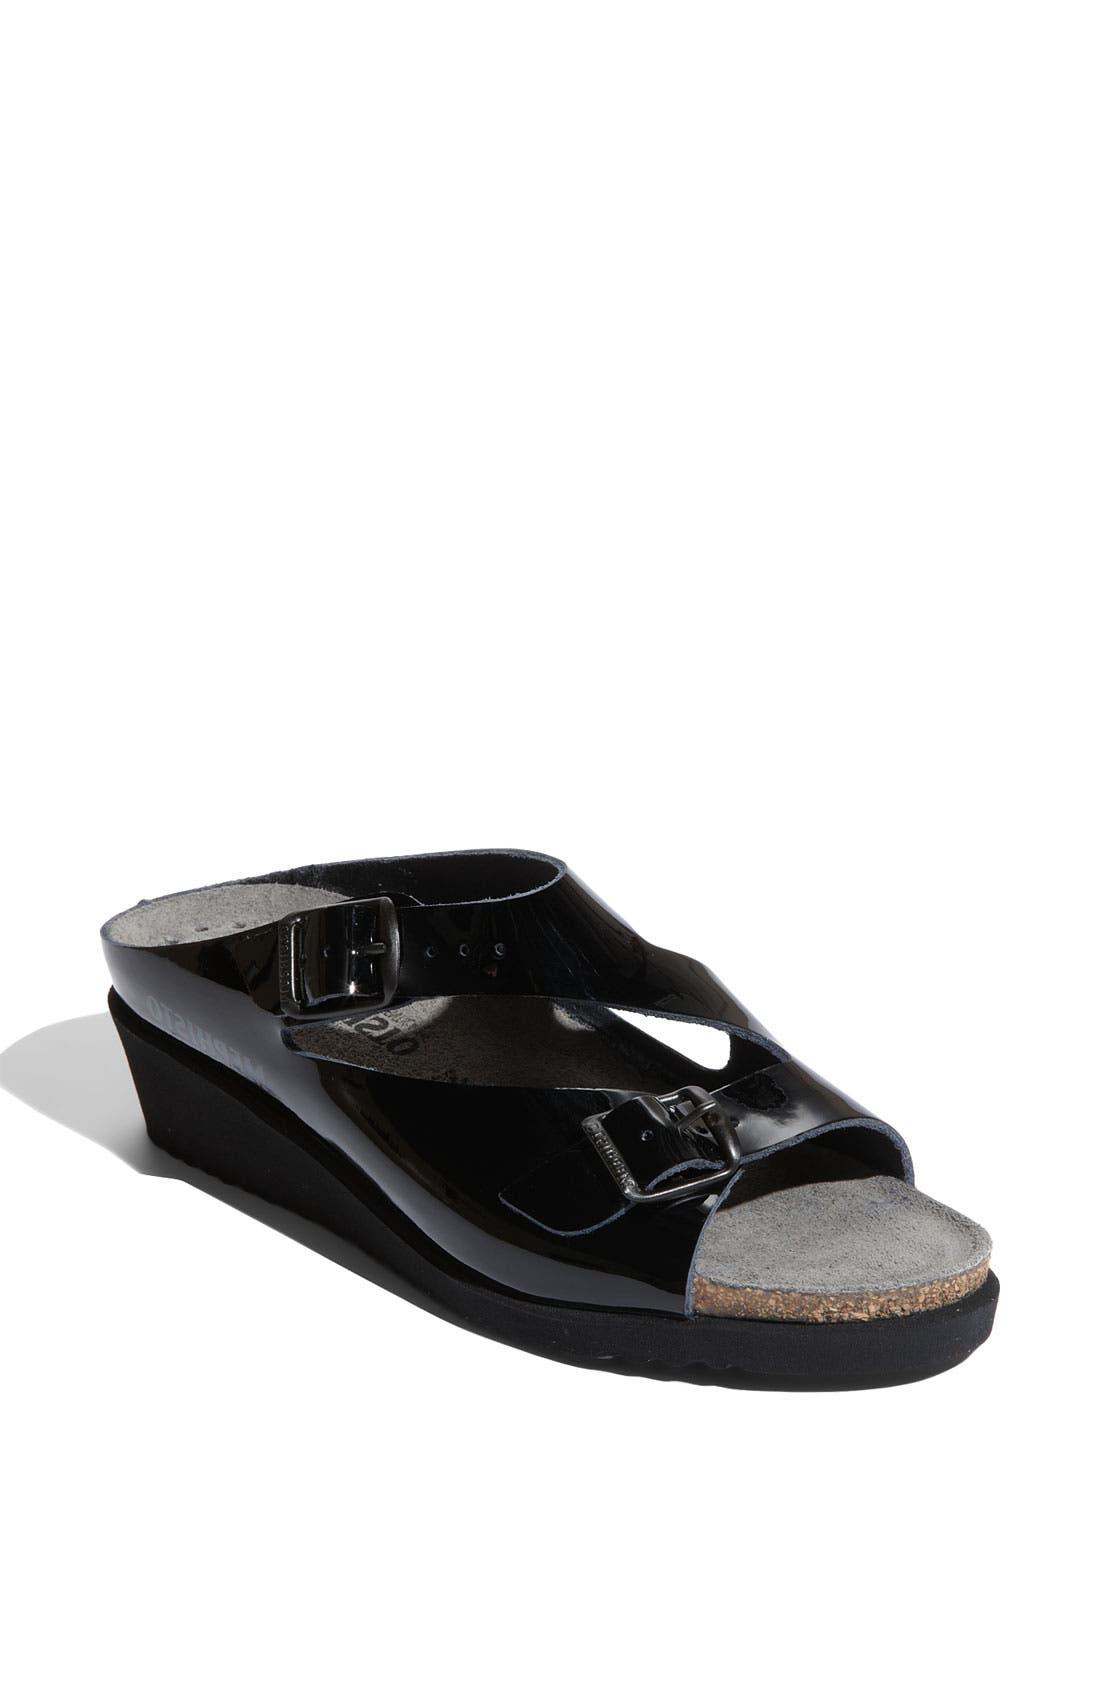 Alternate Image 1 Selected - Mephisto 'Elka' Sandal